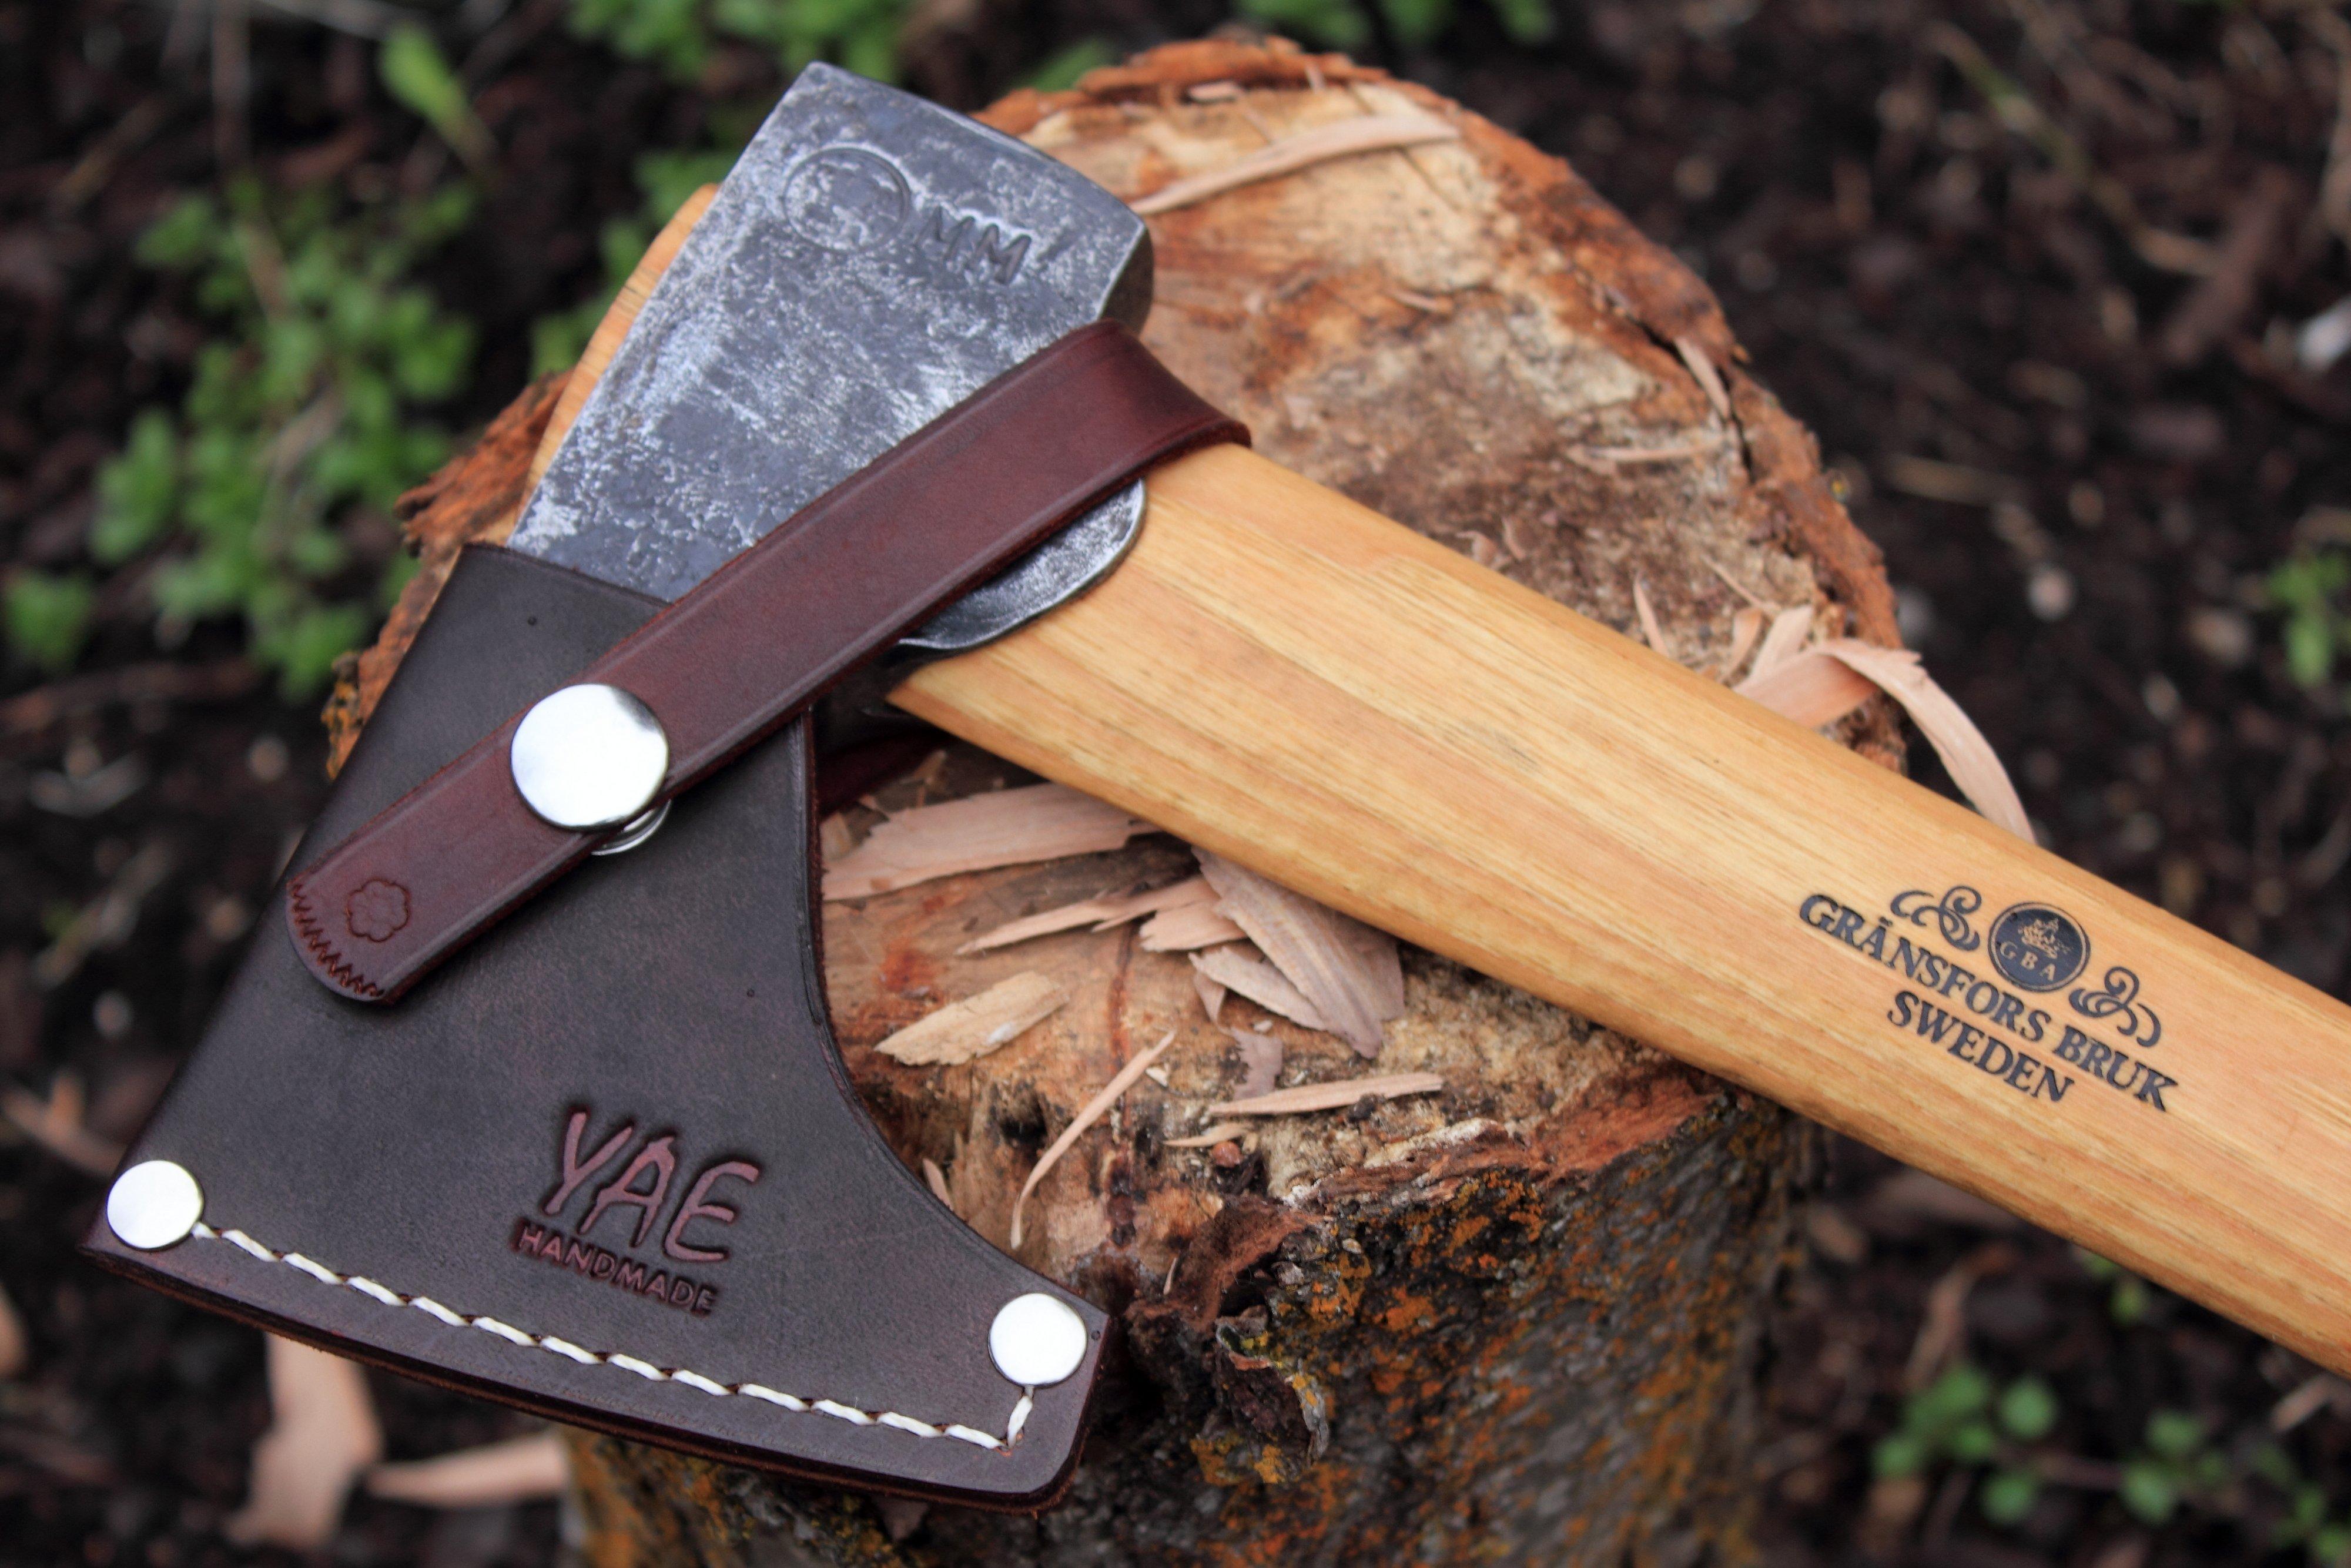 Axe Sheath for Gransfors Bruks Wildlife Hatchet (and G B  Large Carving  Hatchet, Carved Handle)